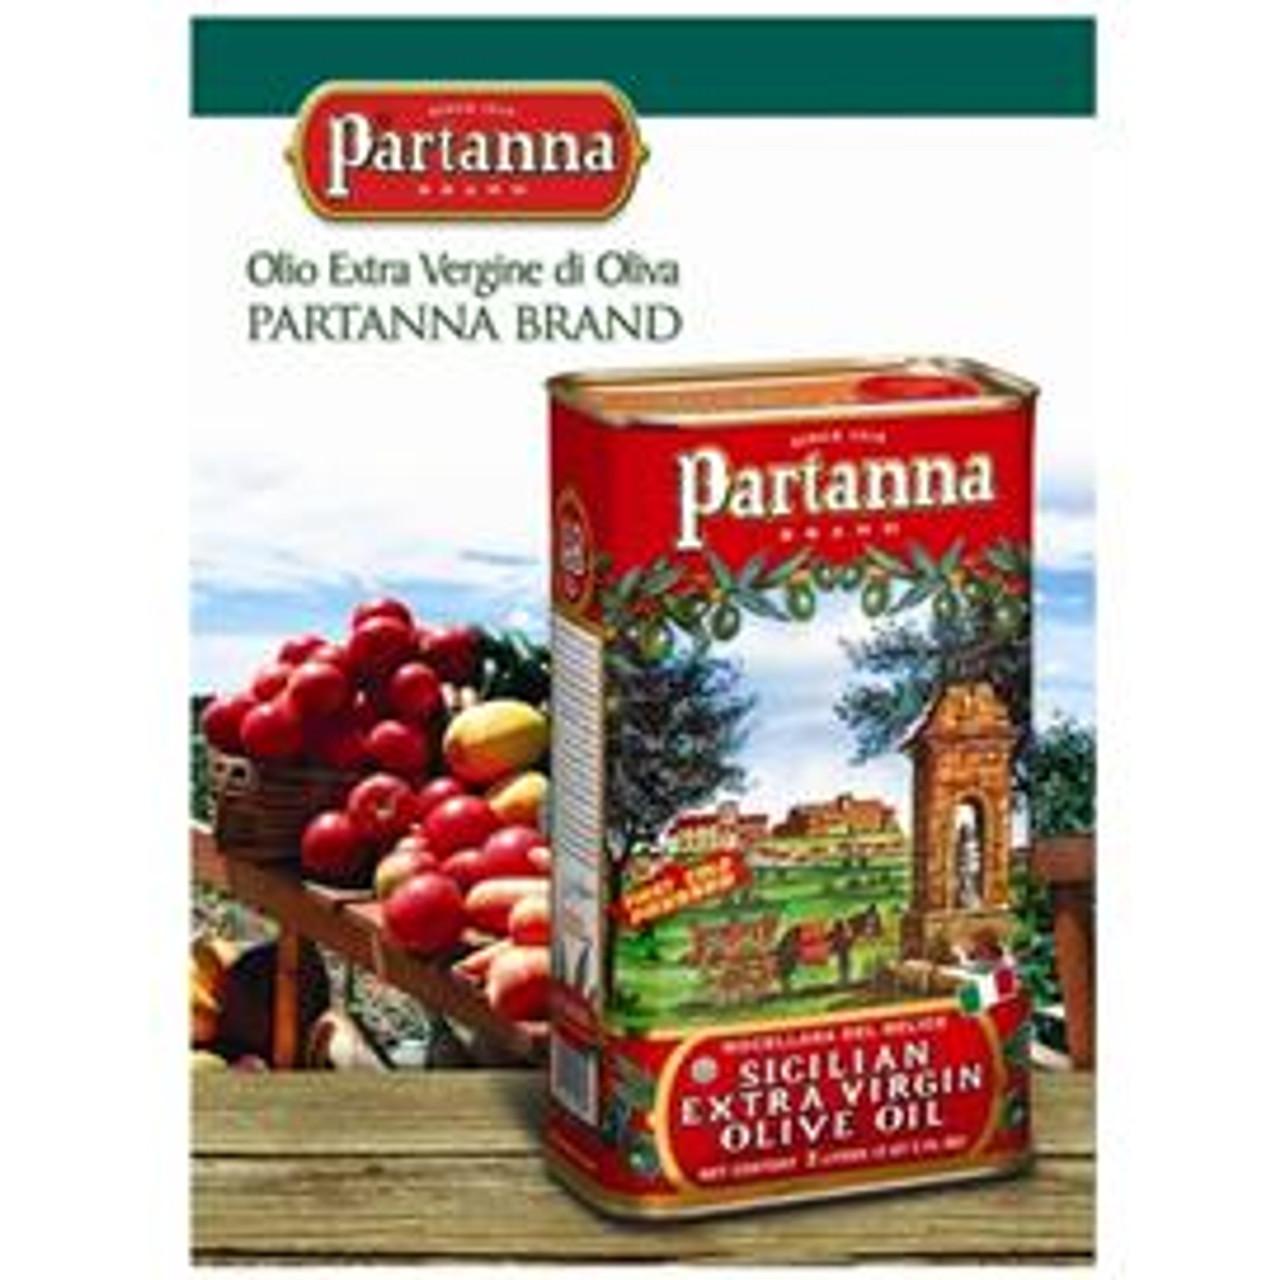 Asaro Partanna Sicilian Extra Virgin Olive Oil